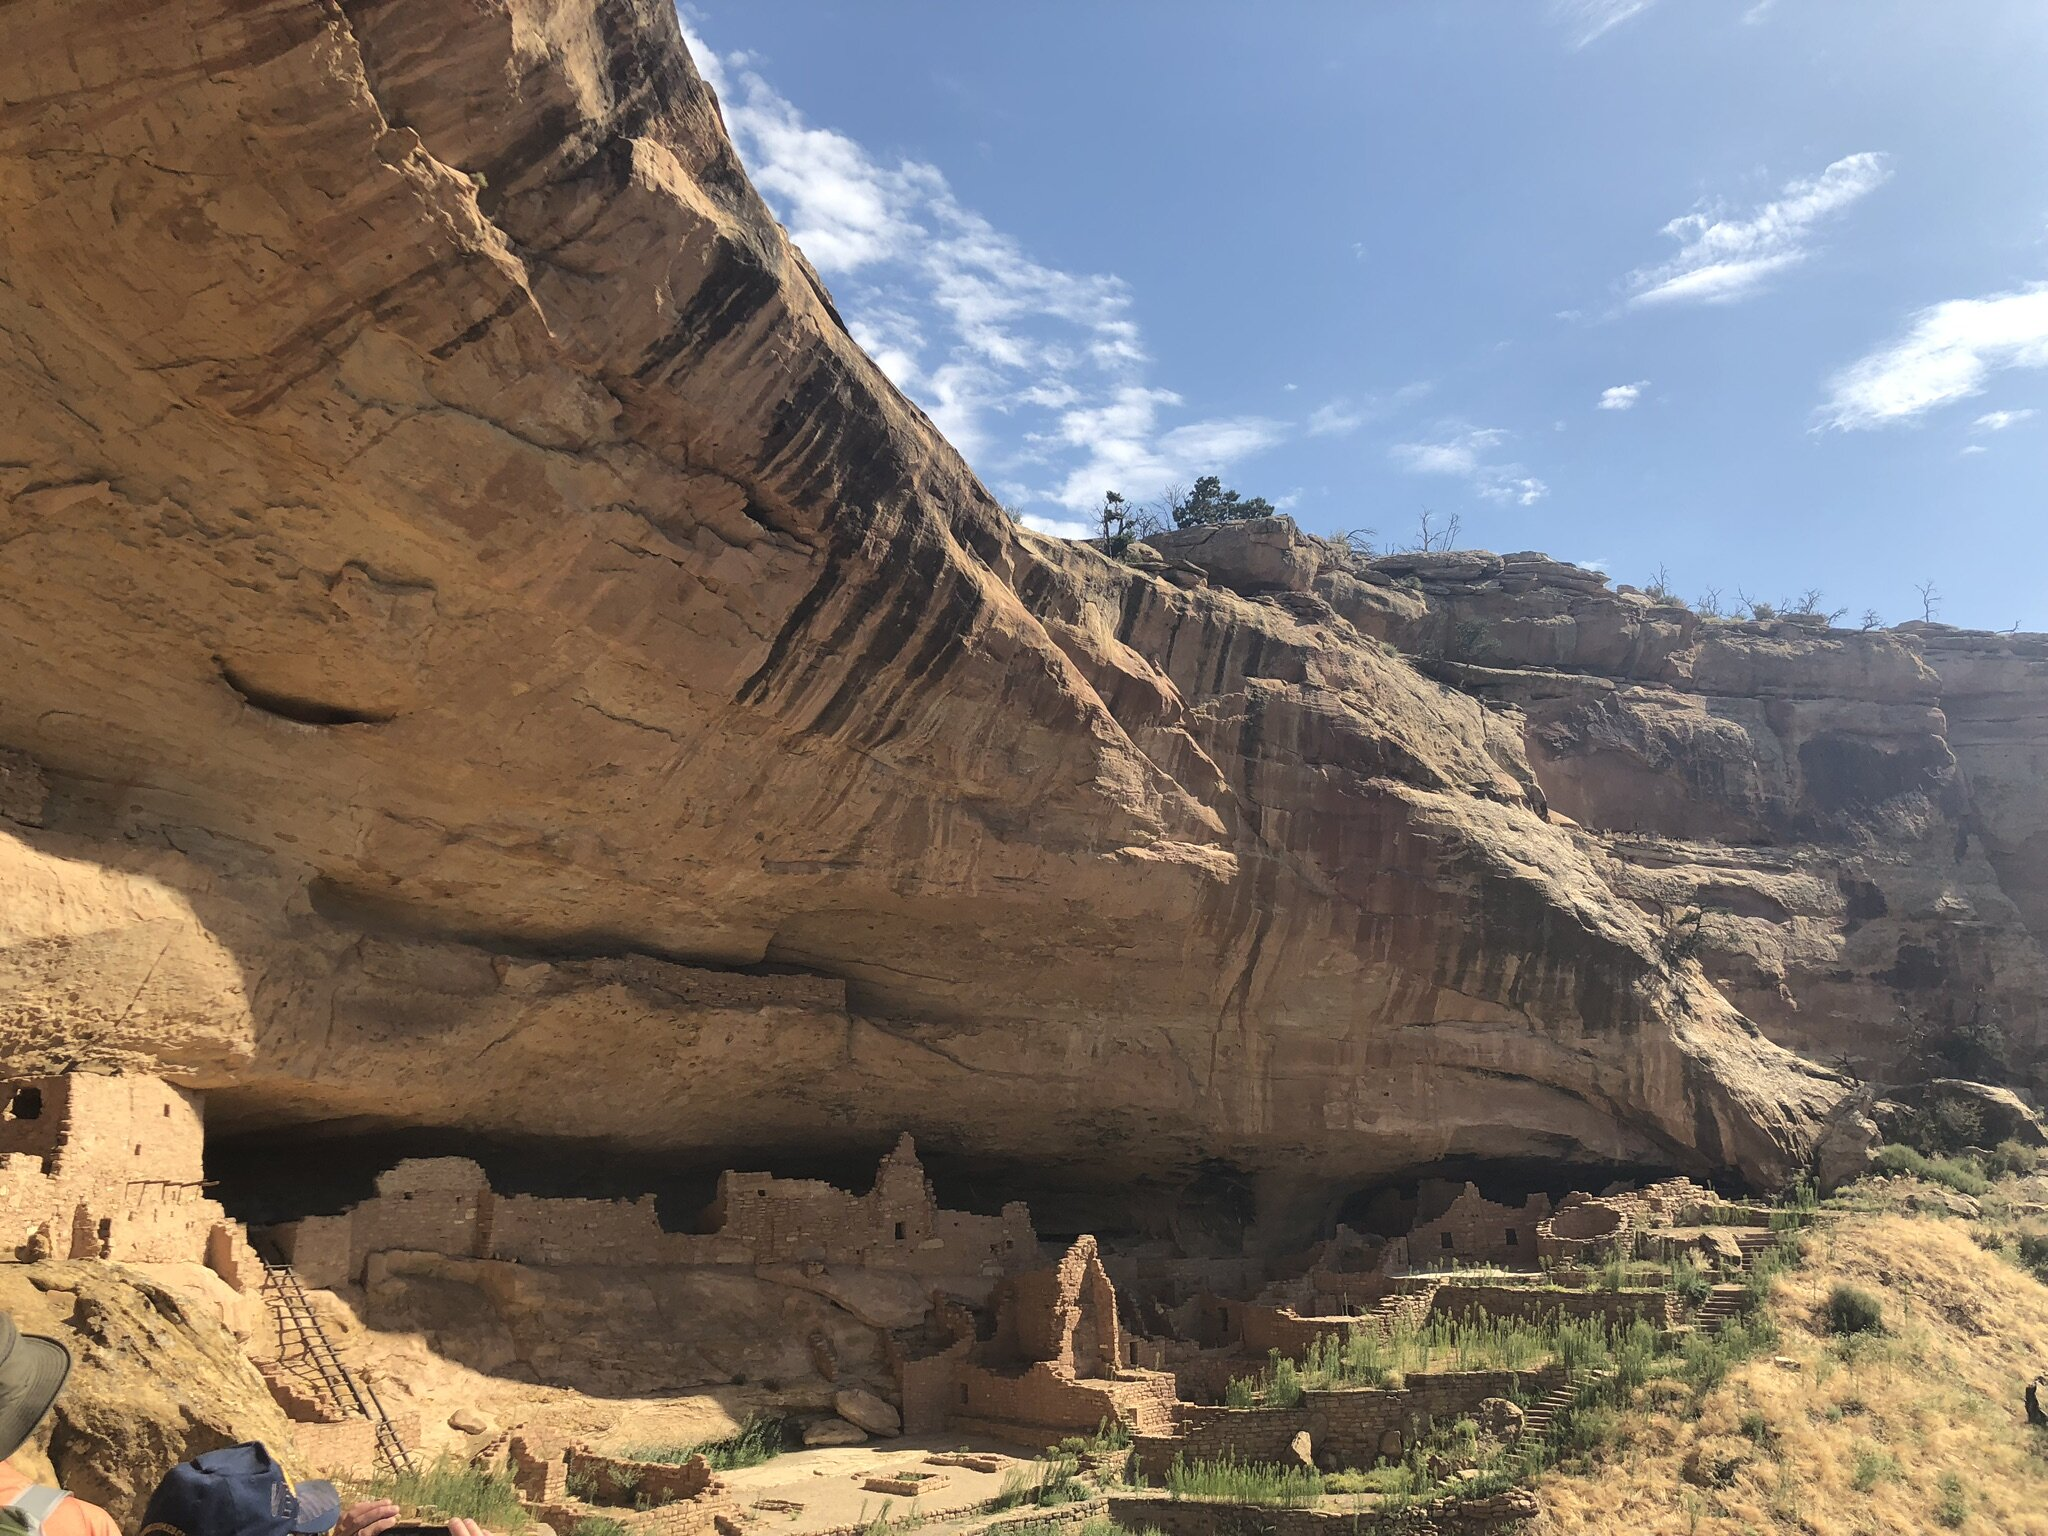 Long House cliff dwelling, Mesa Verde National Park